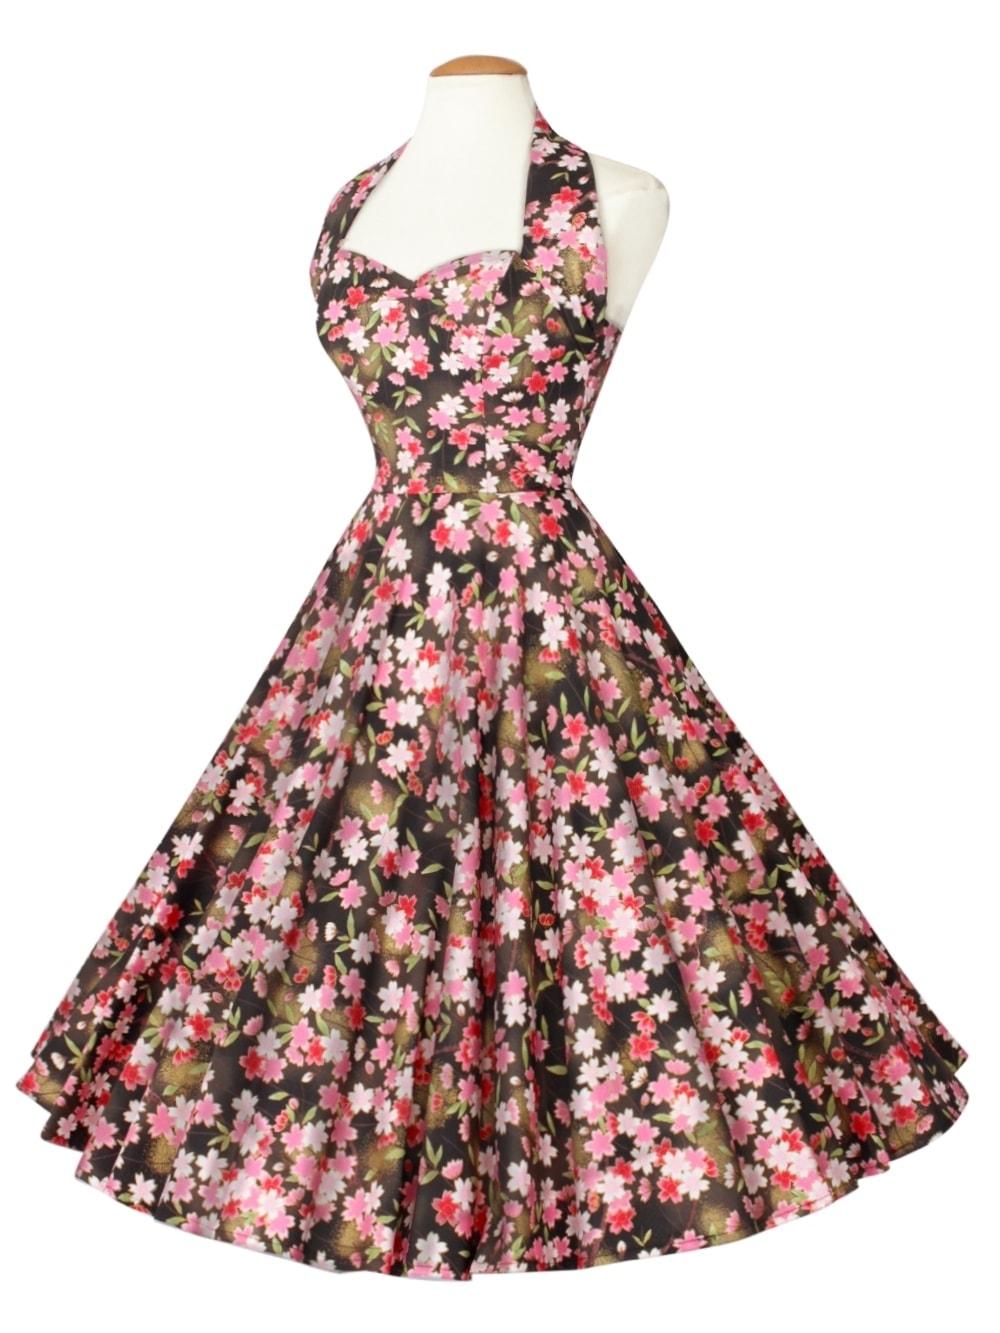 1950s Halterneck Kimono Black Dress from Vivien of Holloway